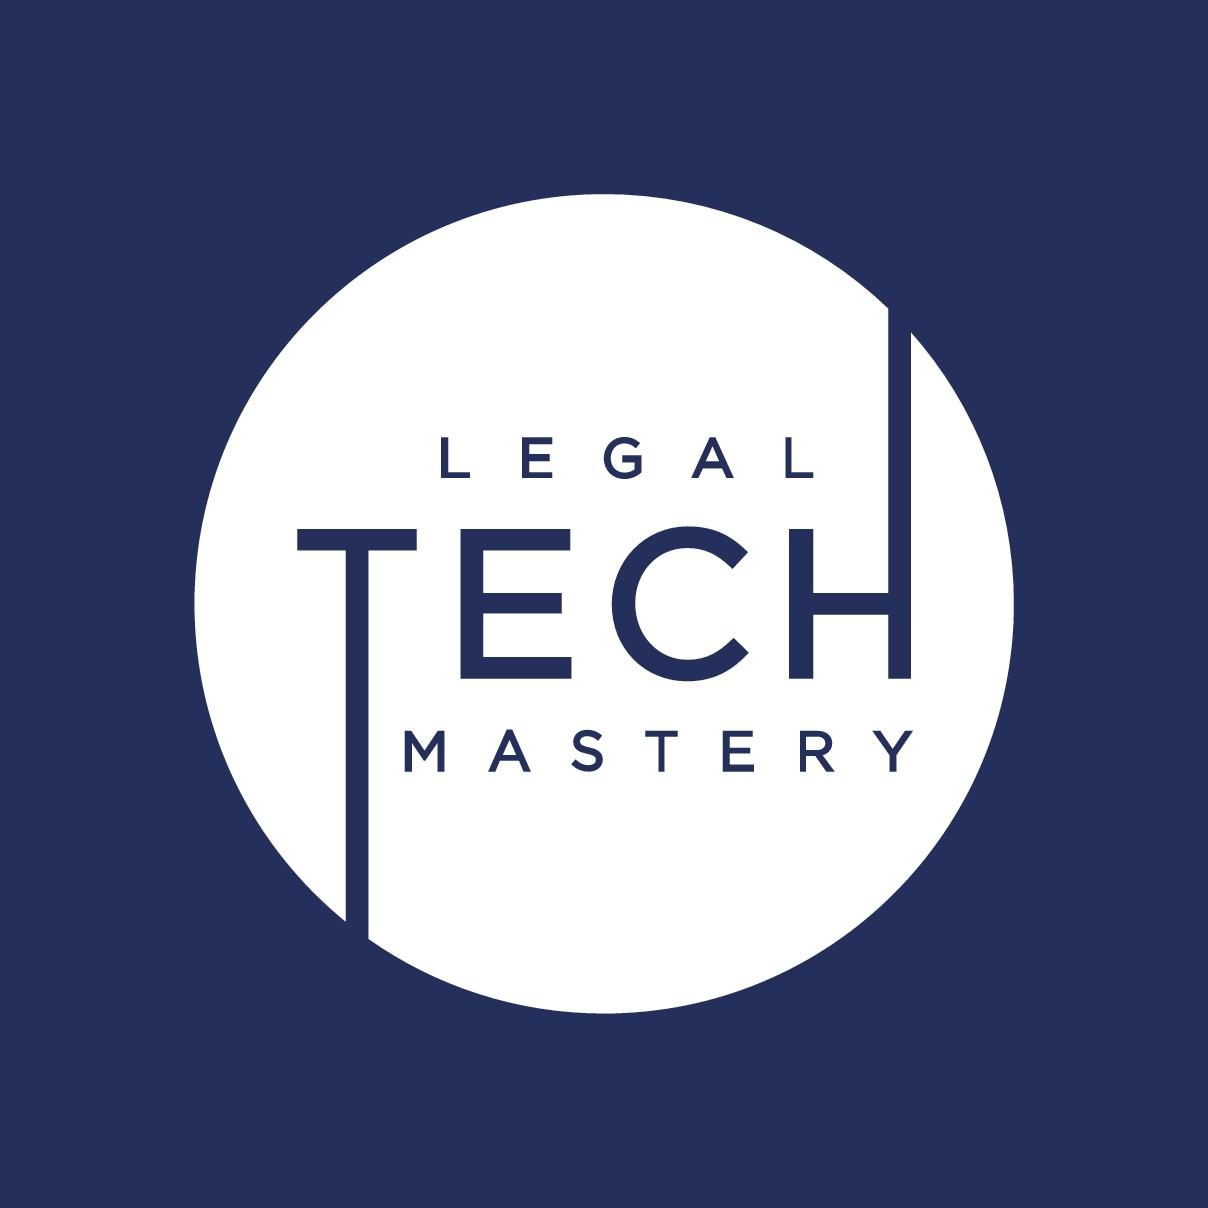 Legal Tech Mastery